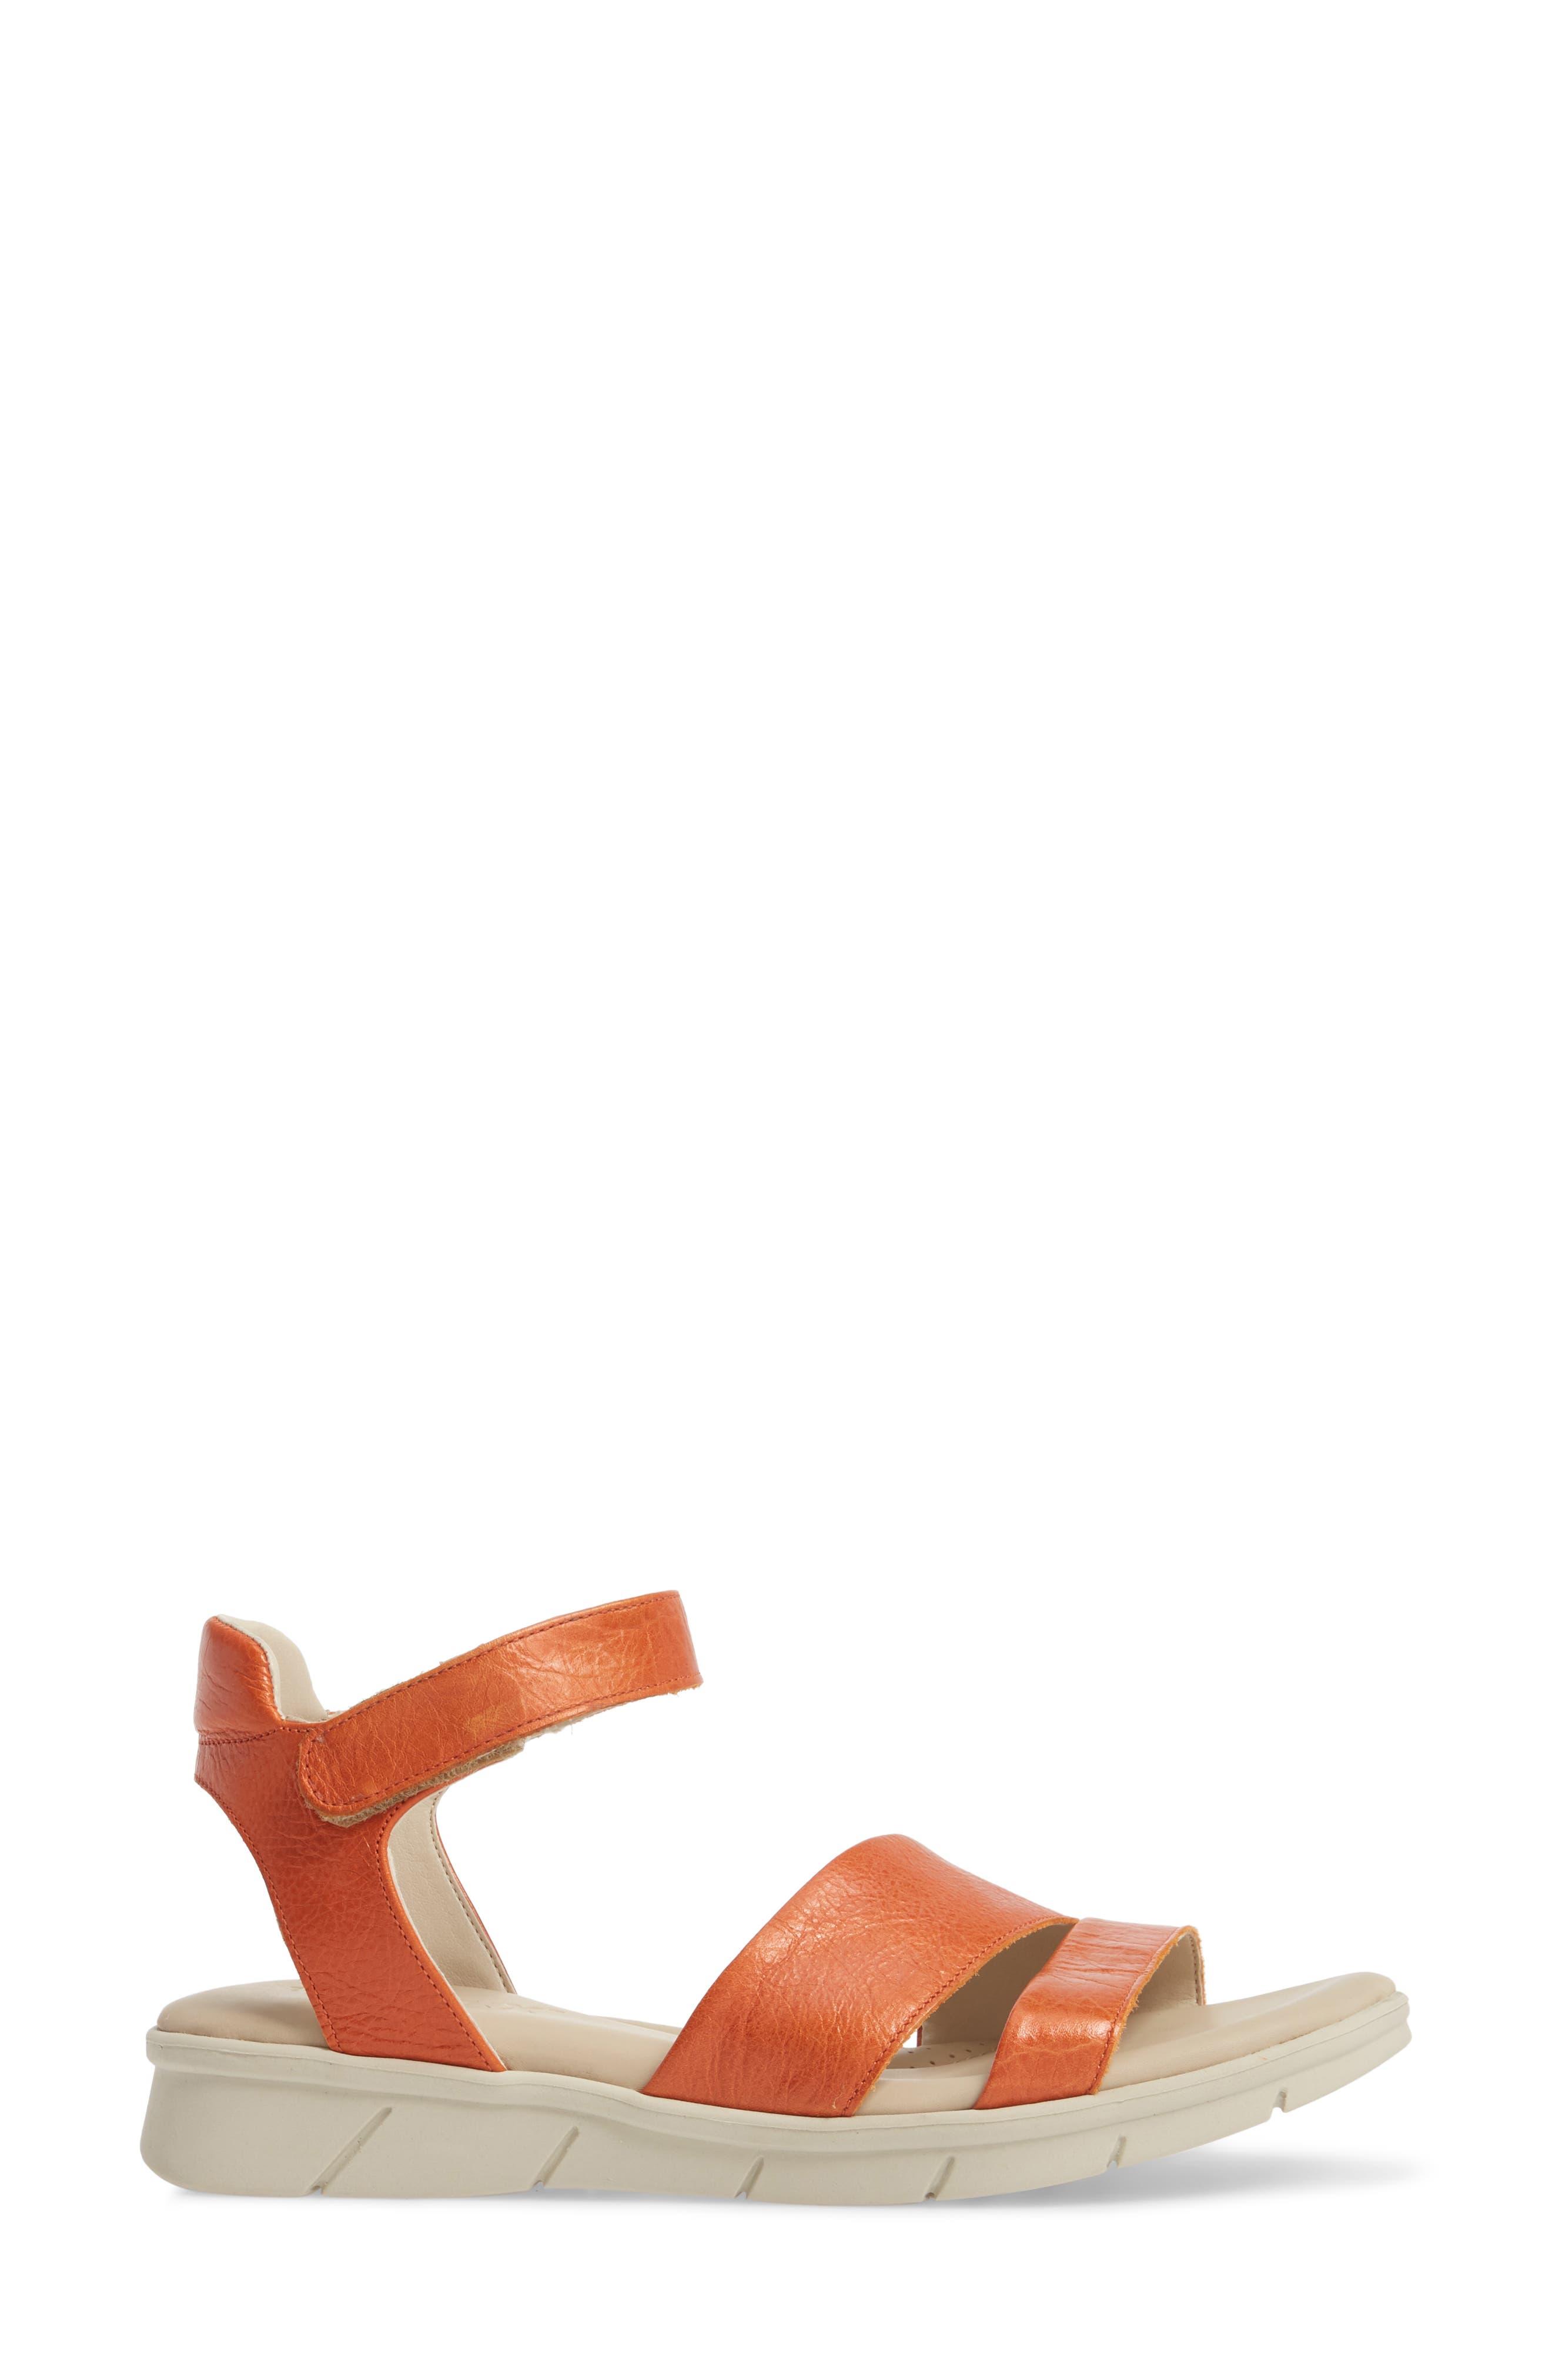 Crossover Ankle Strap Sandal,                             Alternate thumbnail 3, color,                             Mandarin Leather